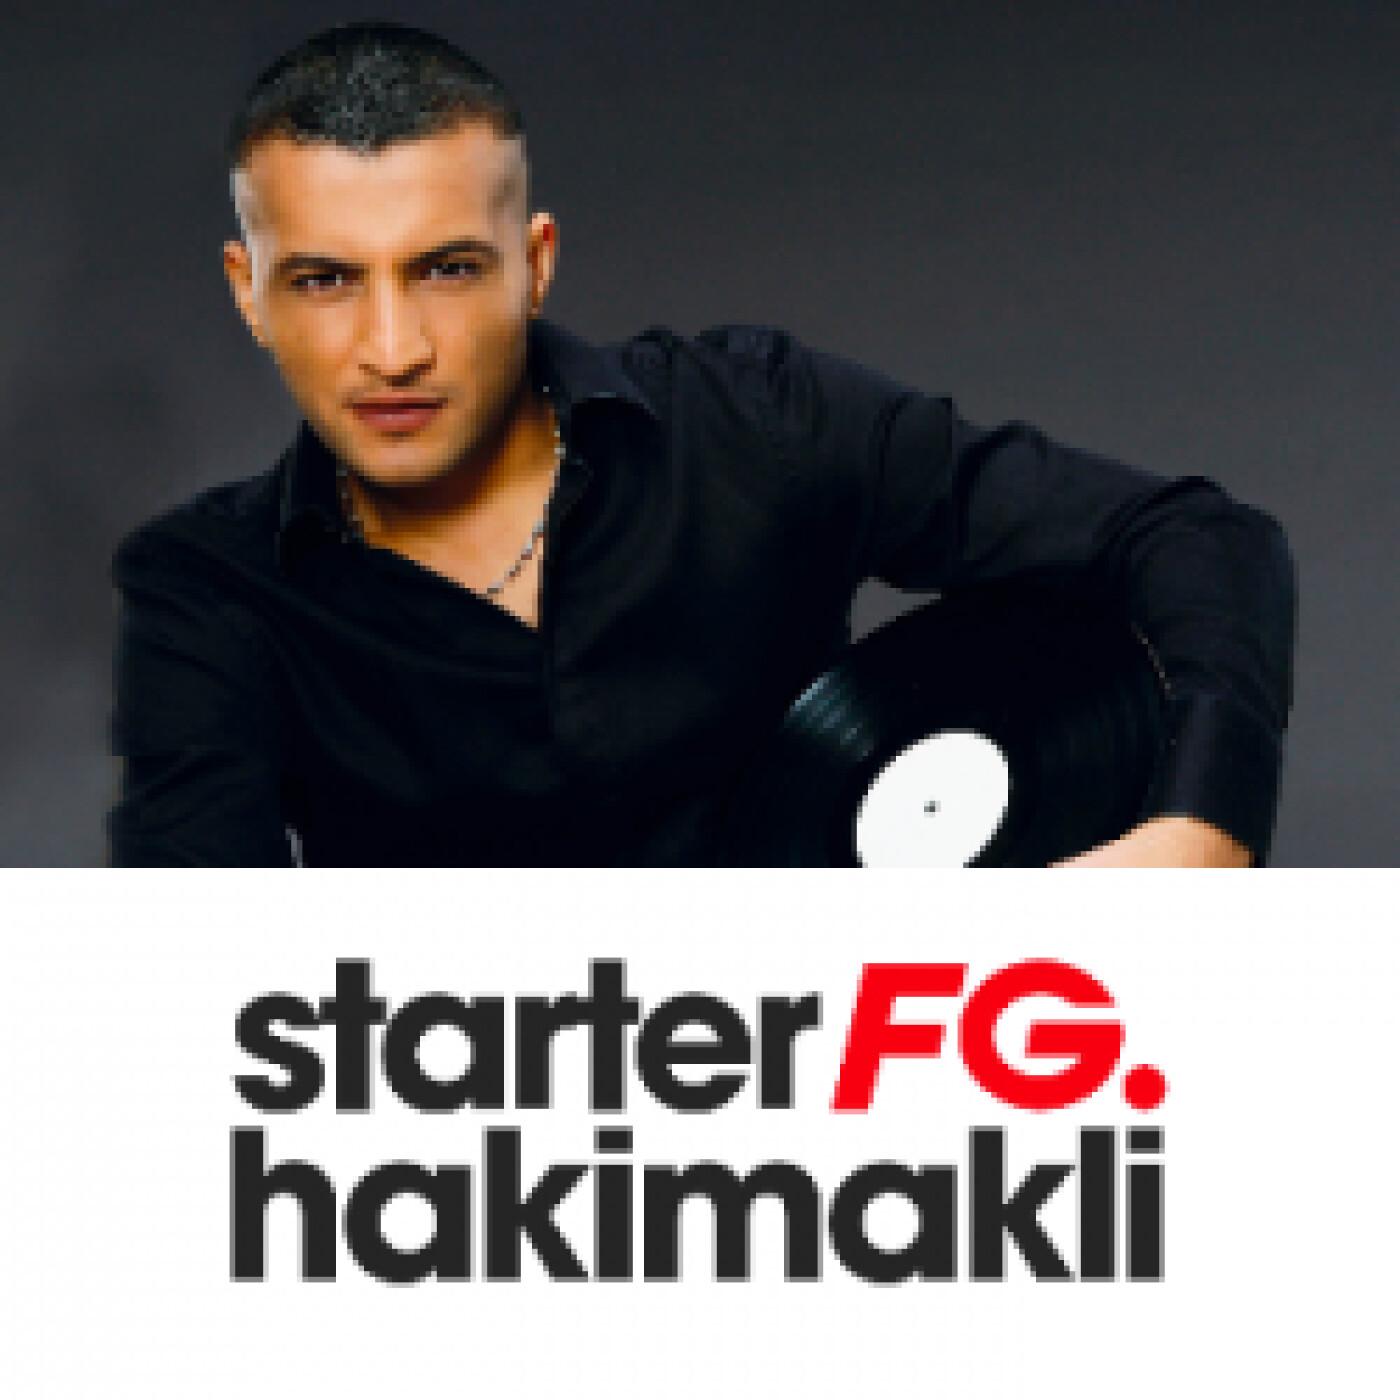 STARTER FG BY HAKIMAKLI MARDI 2 MARS 2021